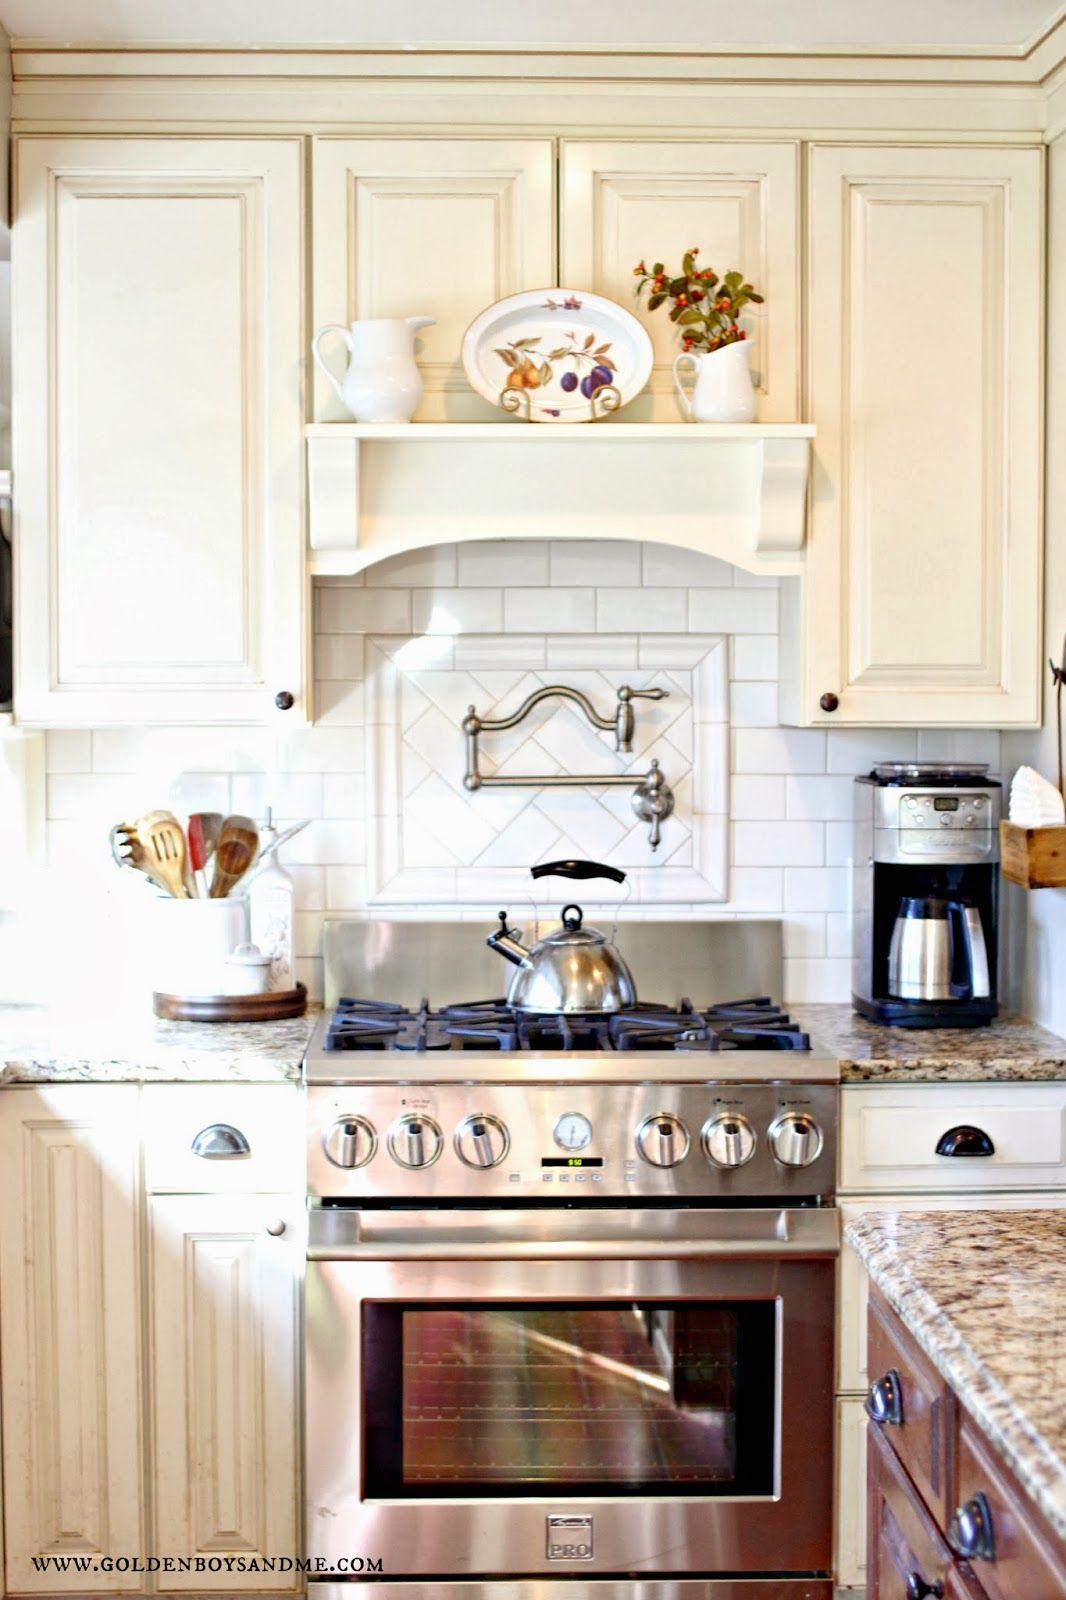 Our Latest Kitchen Makeover Reveal  Kitchen design